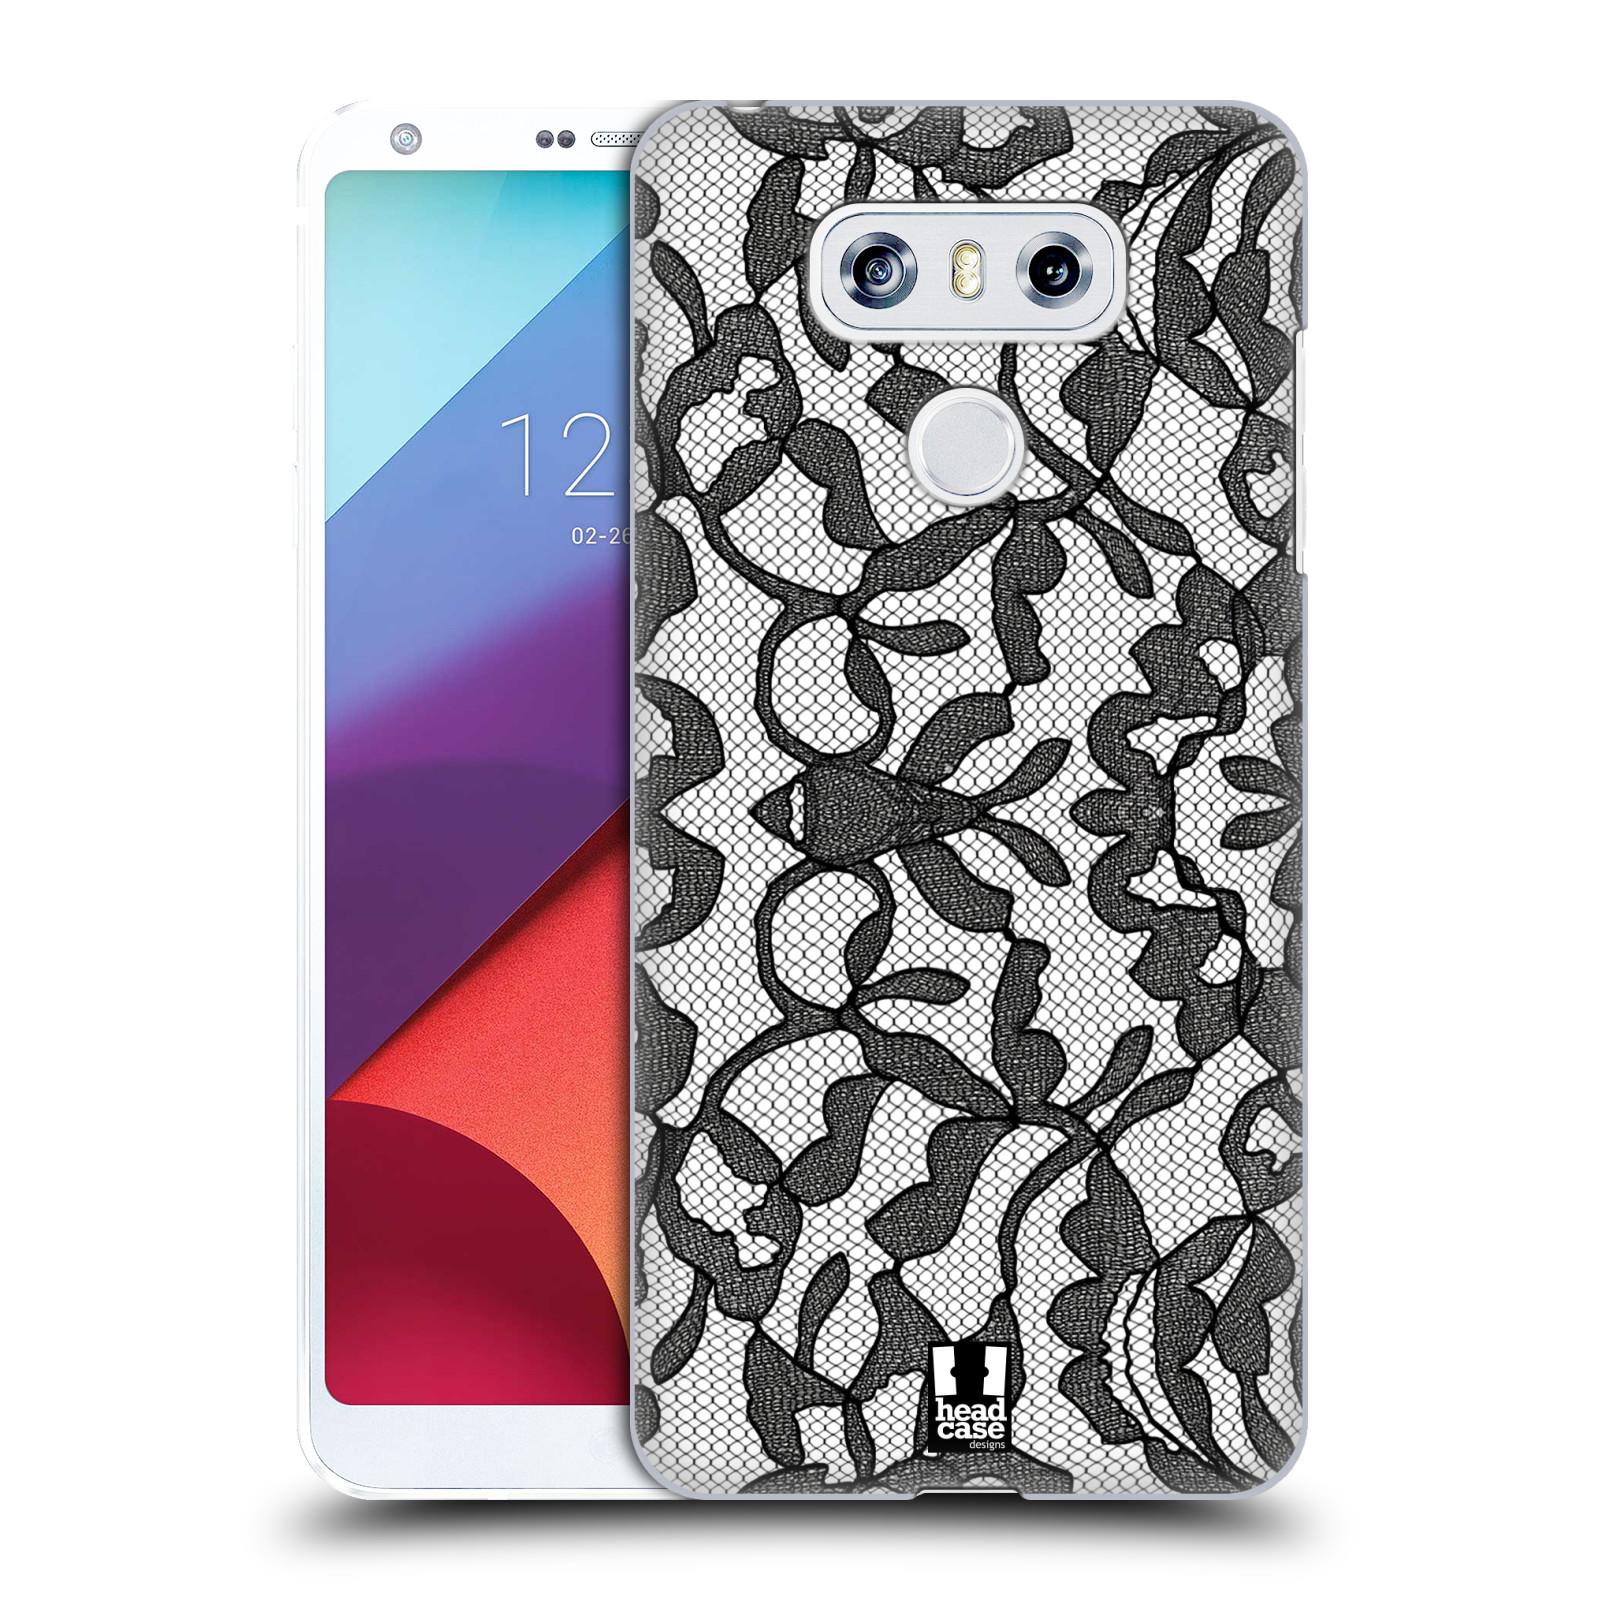 Plastové pouzdro na mobil LG G6 - Head Case LEAFY KRAJKA